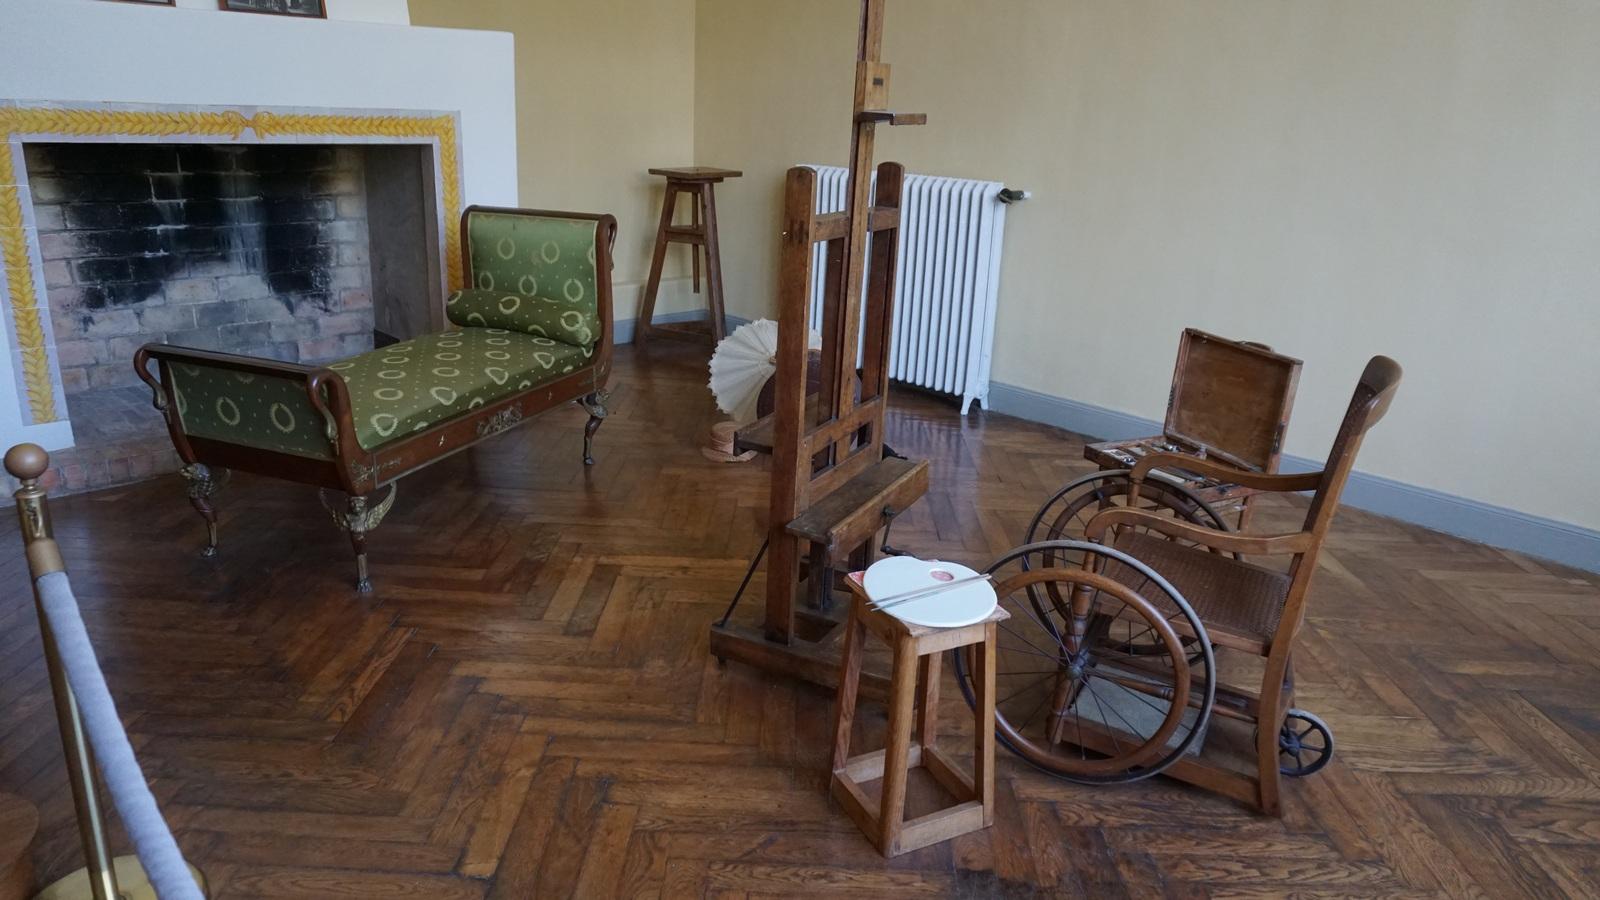 Renoir's studio in Les Collettes